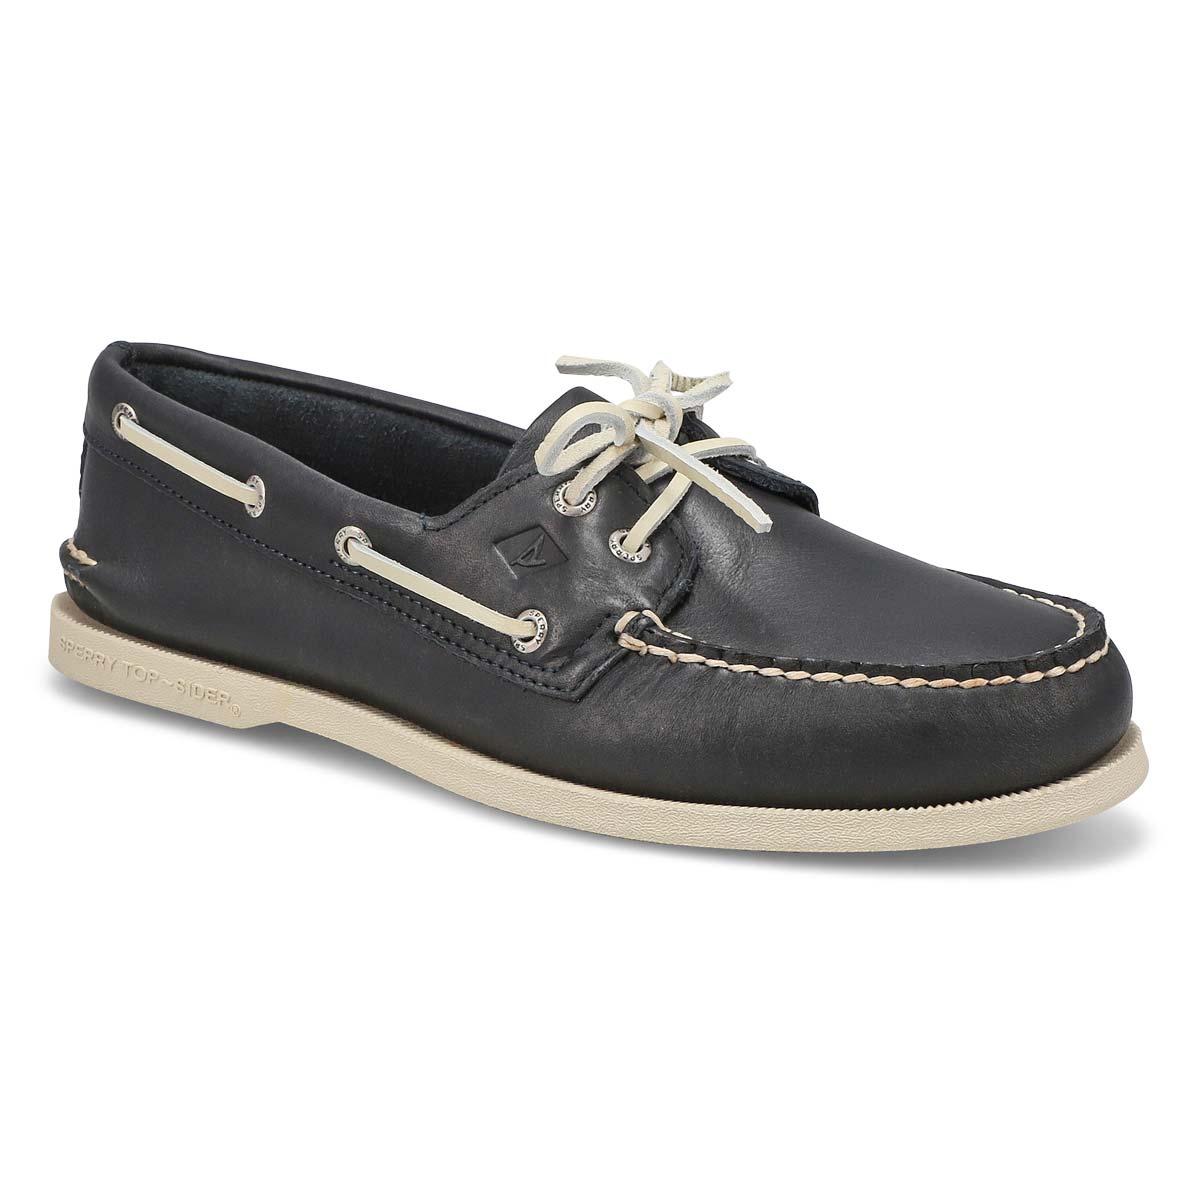 Men's AUTHENTIC ORIGINAL 2-eye navy boat shoes